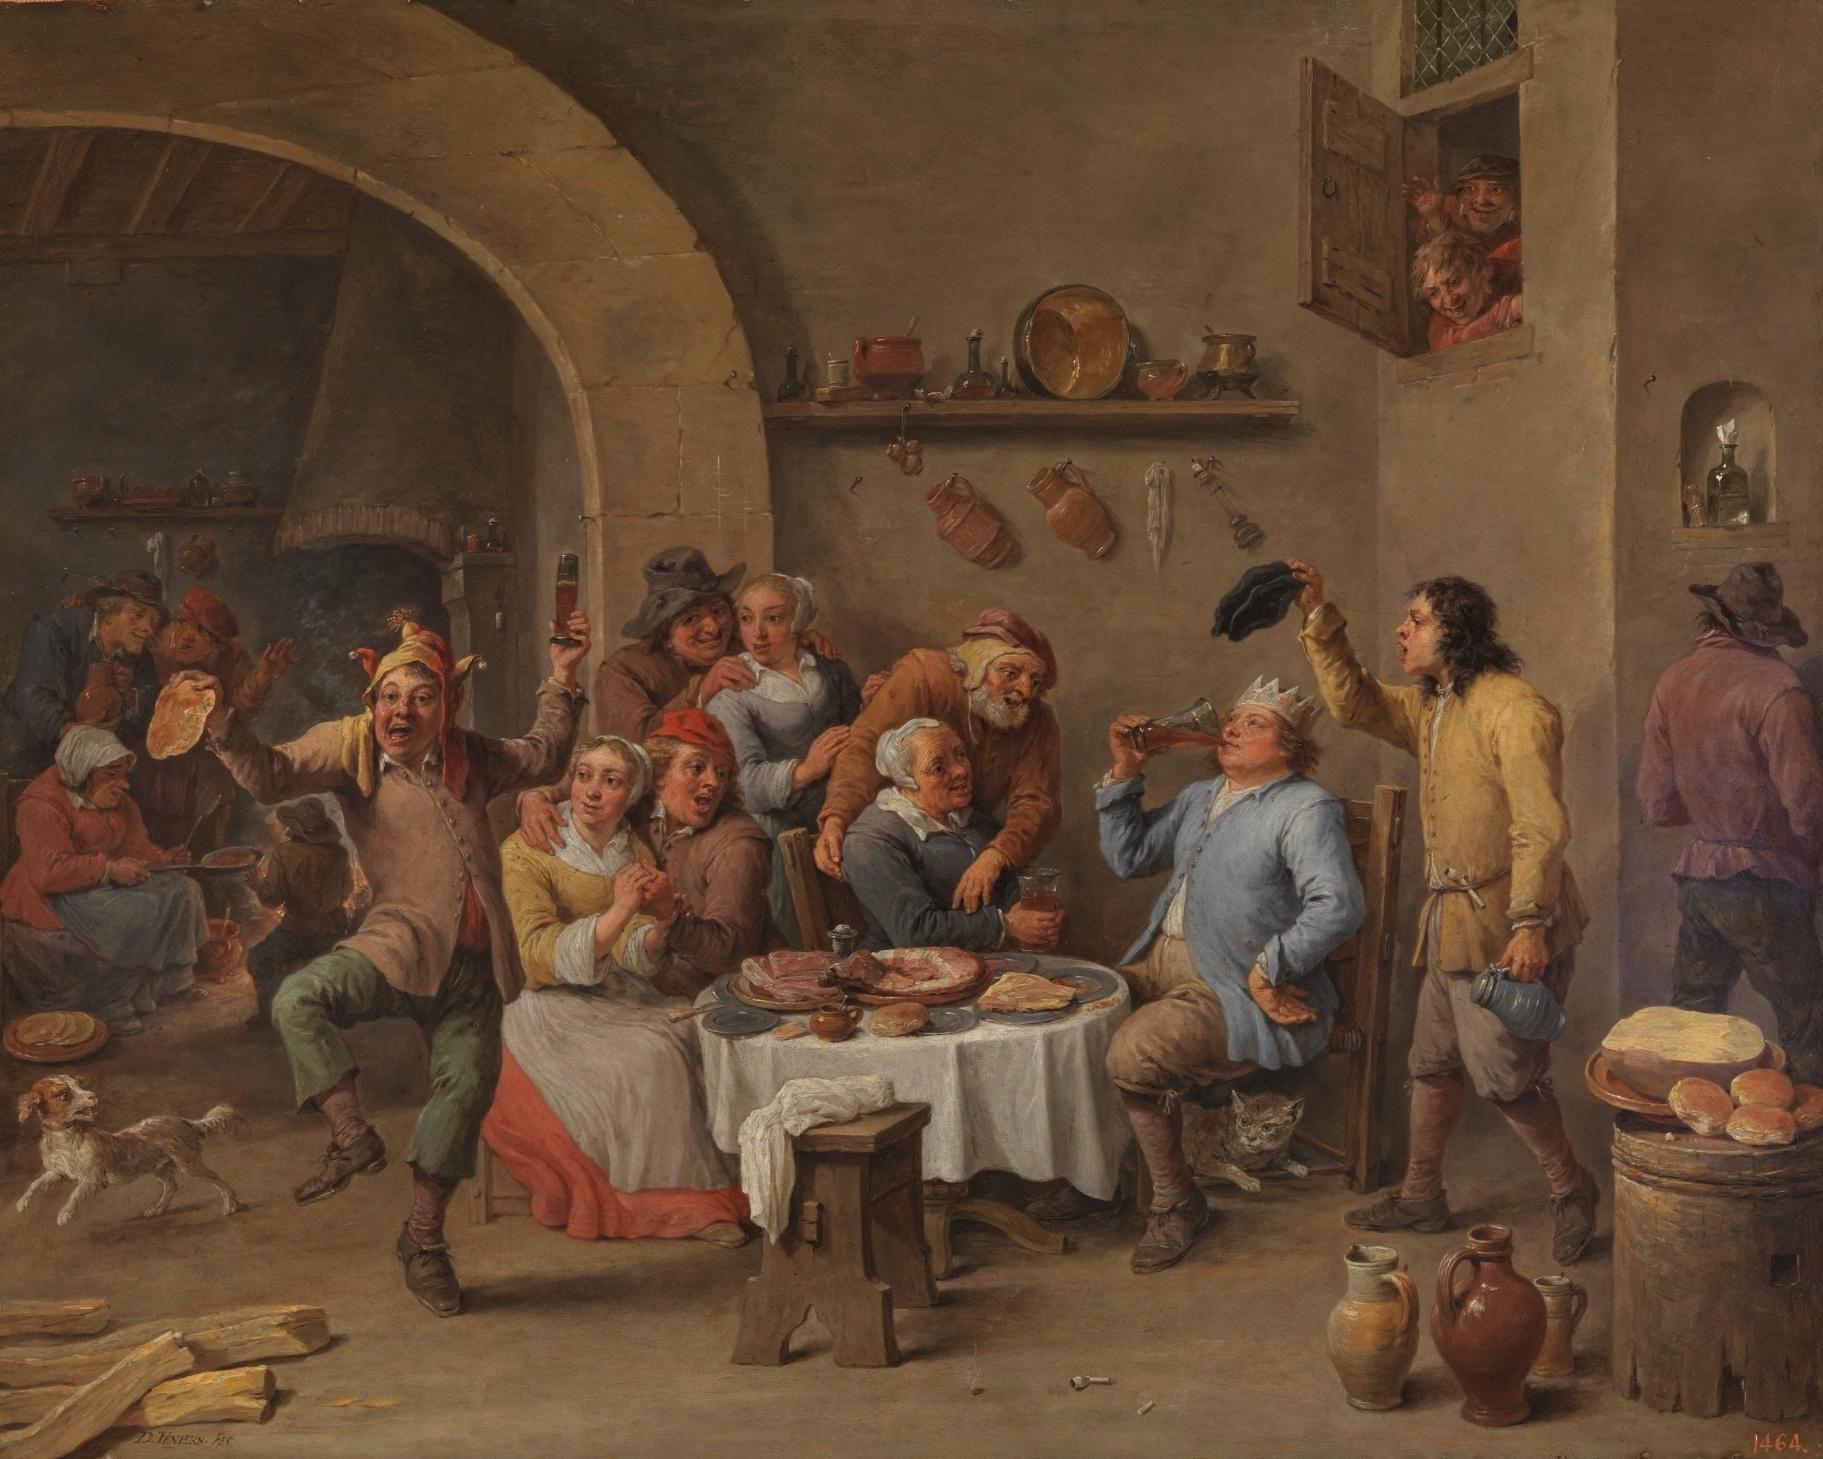 David_Teniers_(II)_-_Twelfth-night_(The_King_Drinks)_-_WGA22083-2.jpg